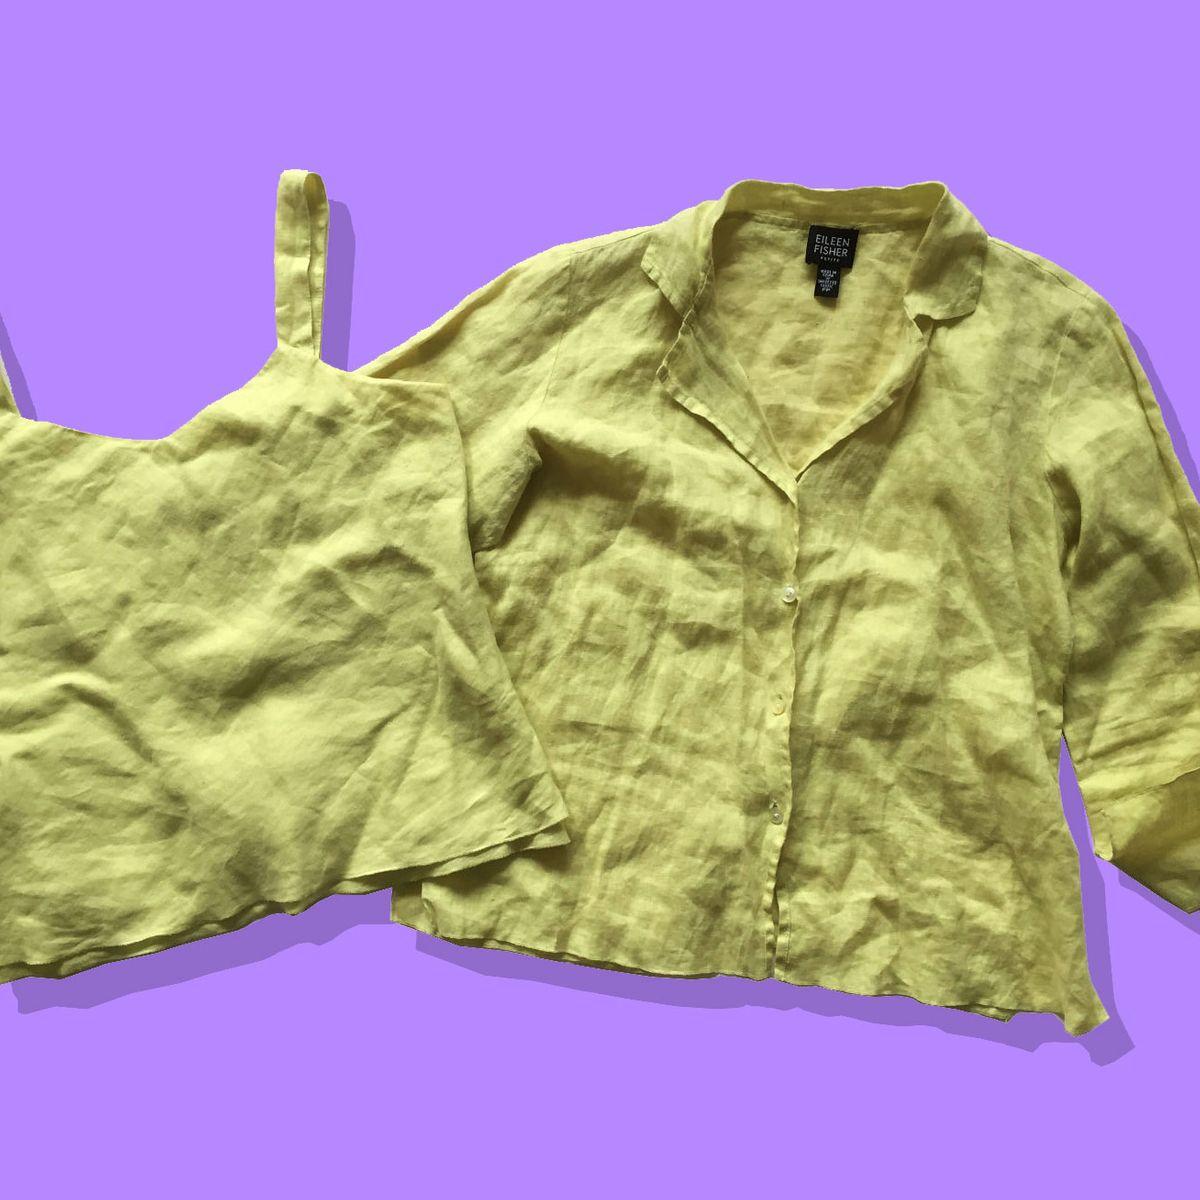 The Best Secondhand Eileen Fisher Linen On Ebay 2018 The Strategist New York Magazine